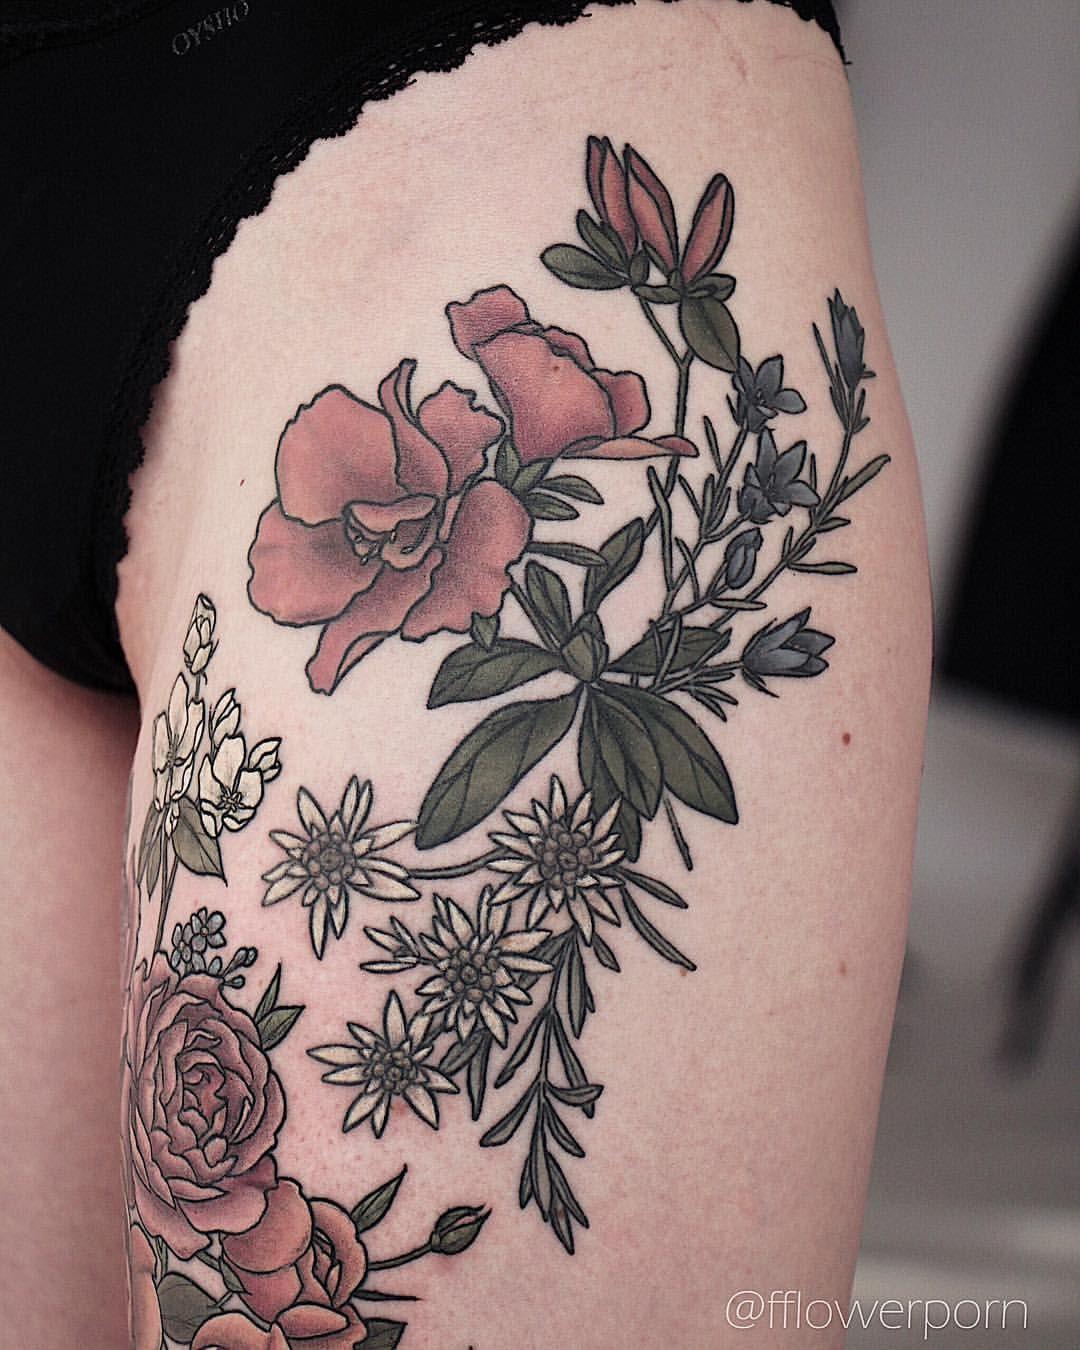 Healed tattoo tattoos plants flowers botanical